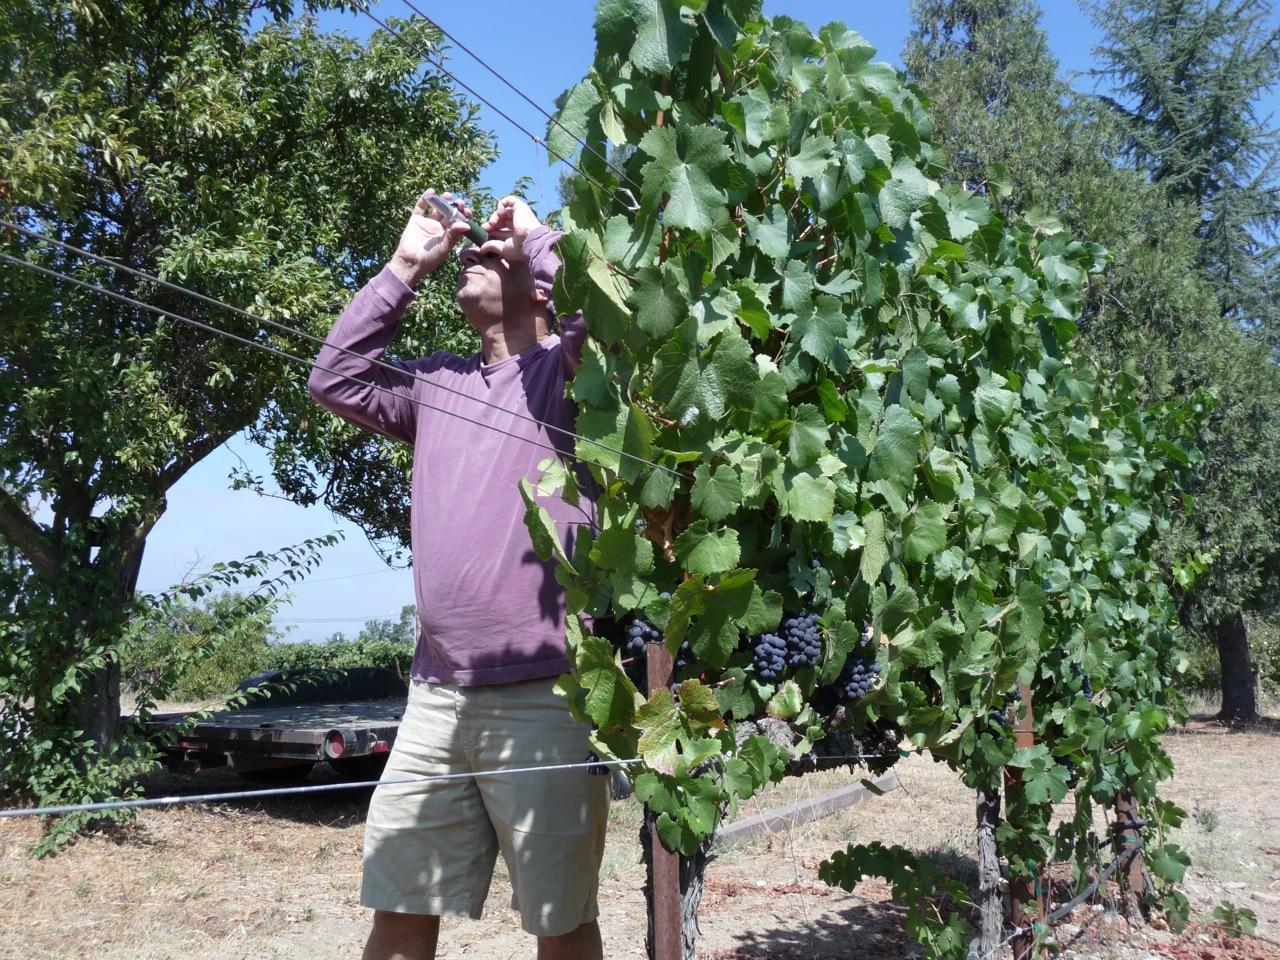 Uzi taking Brix measurements in the vineyard